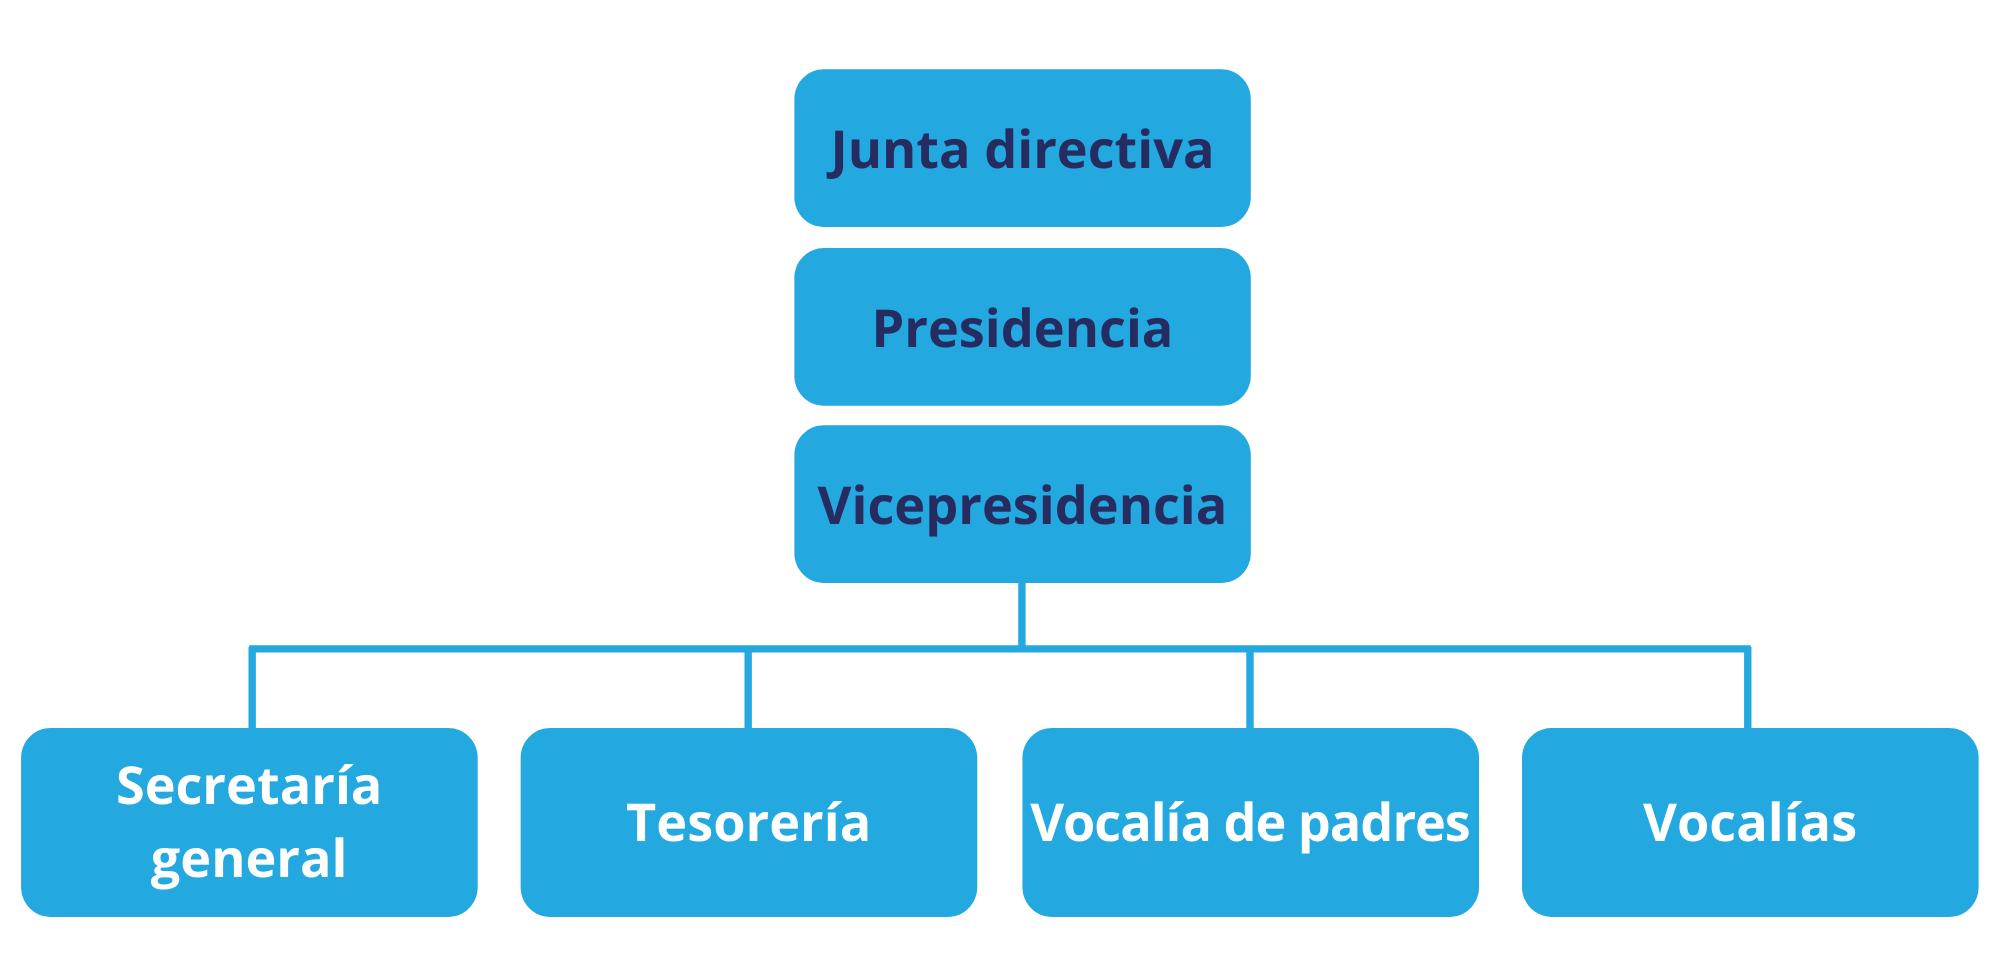 Junta directiva de la ADC